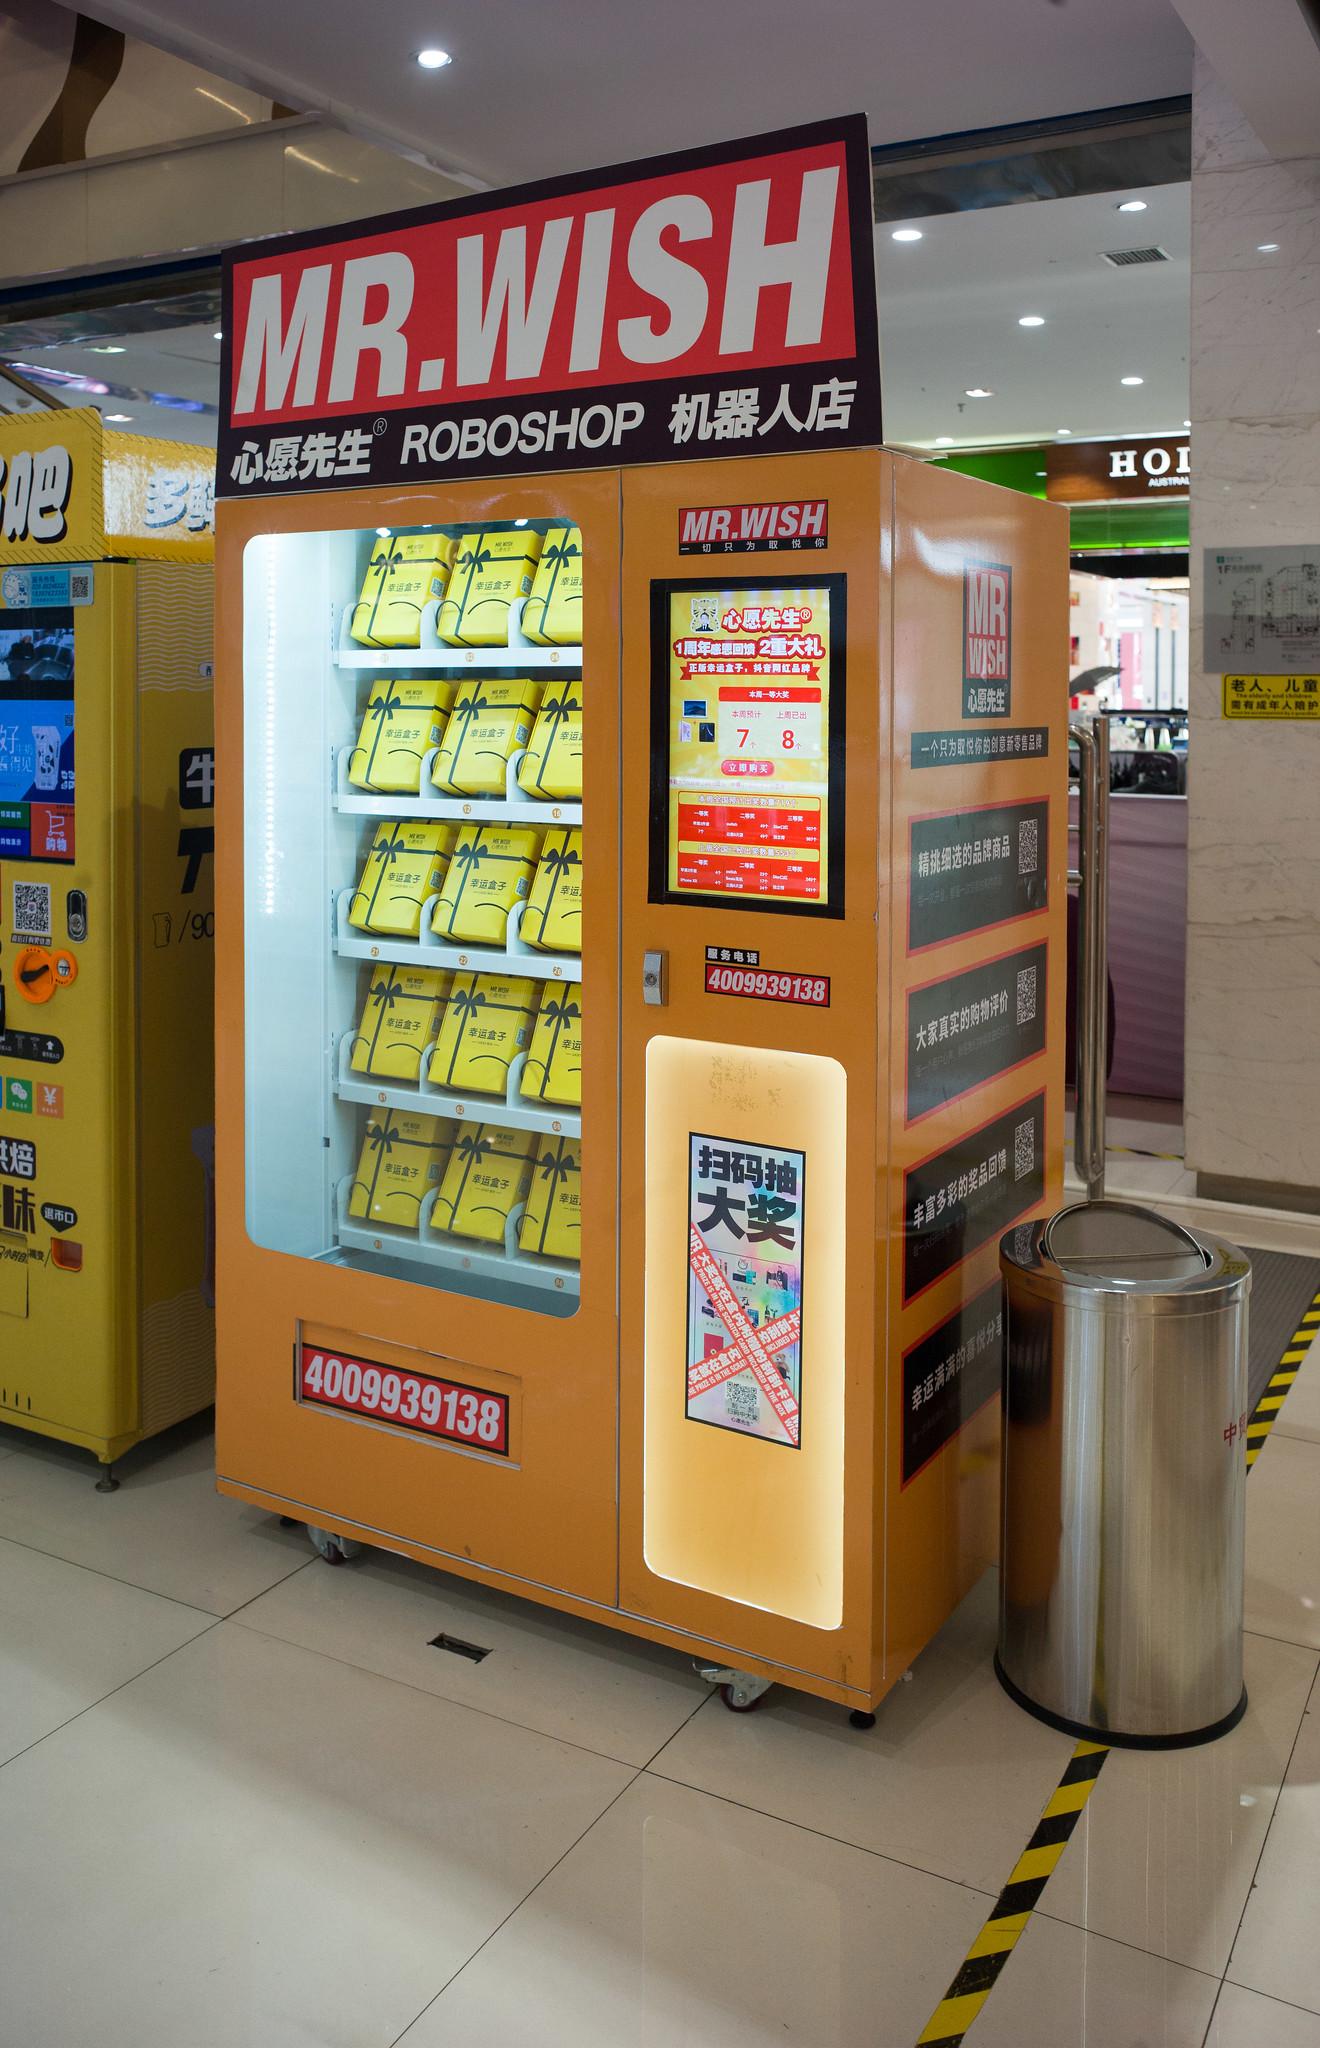 Automat mr wish